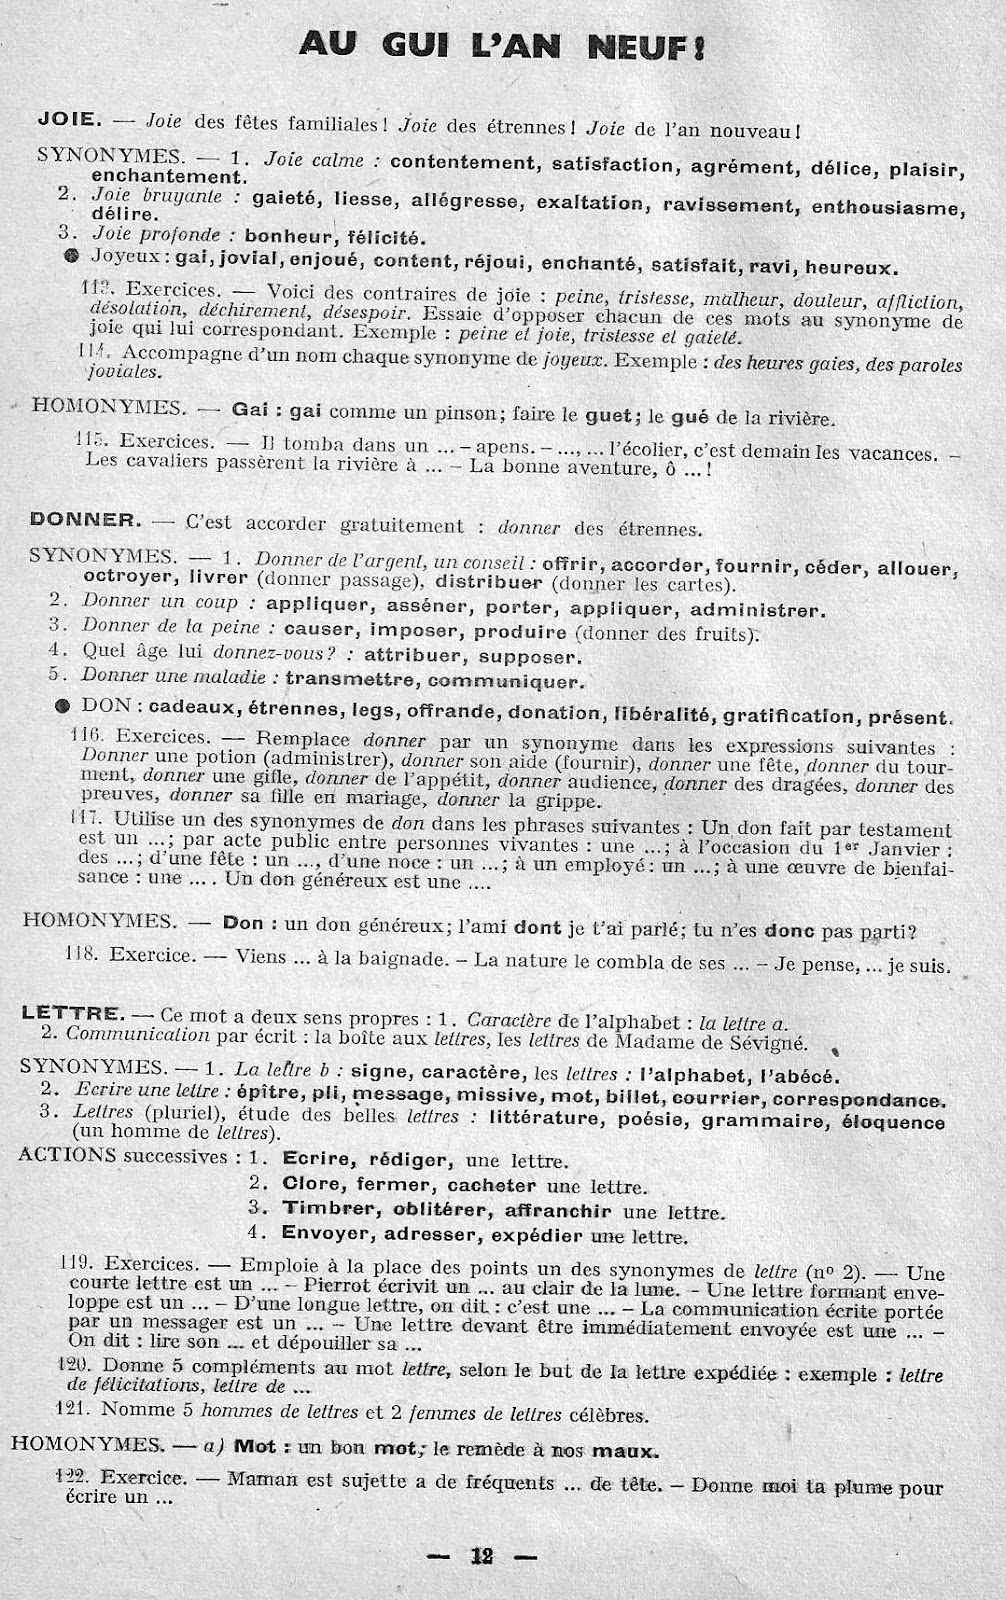 Manuels anciens: J. Anscombre, Synonymes et Homonymes